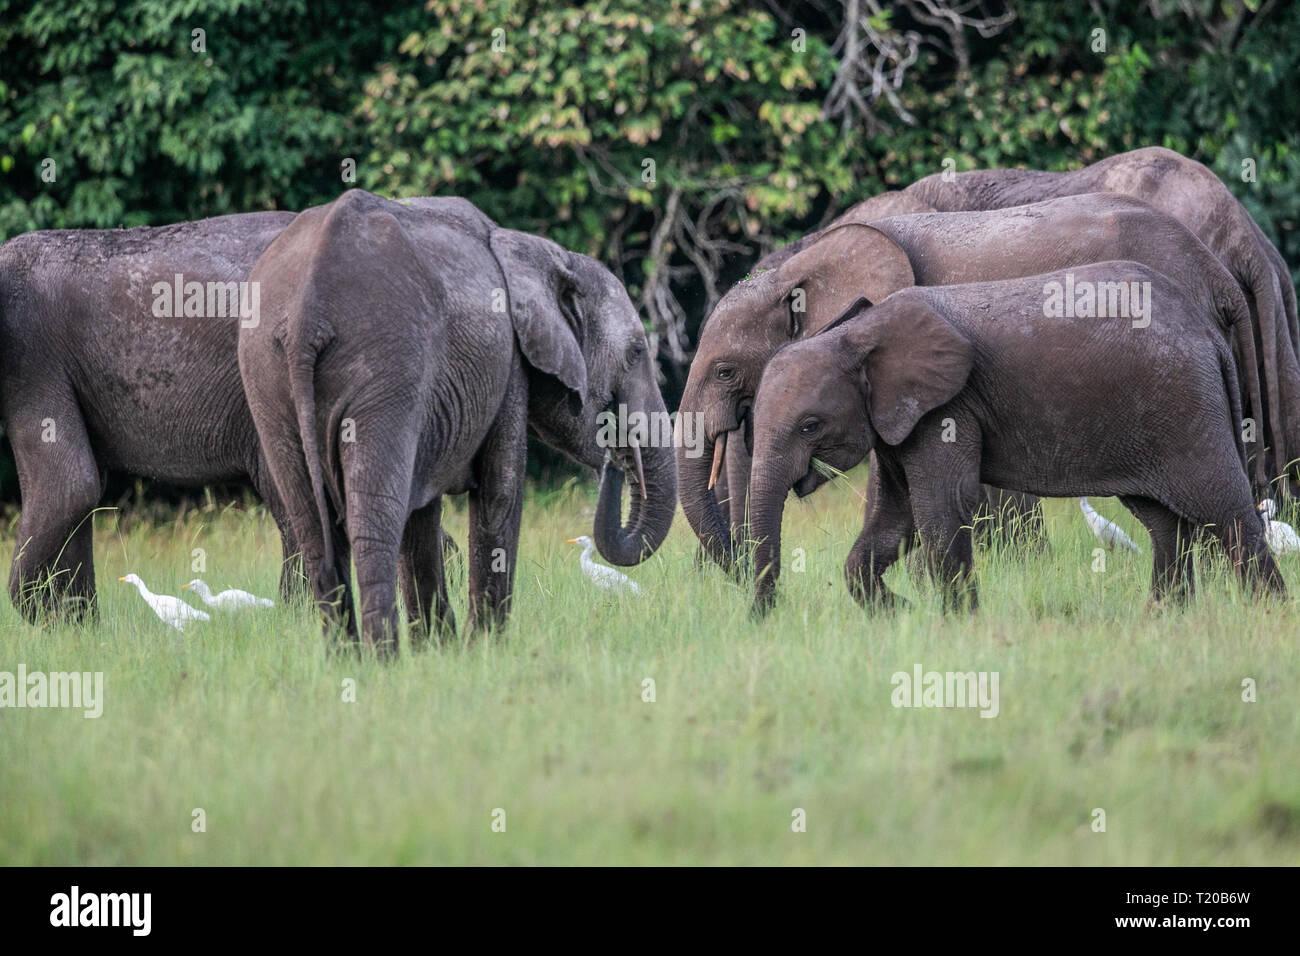 Elephants in Loango National Park, Gabon Stock Photo